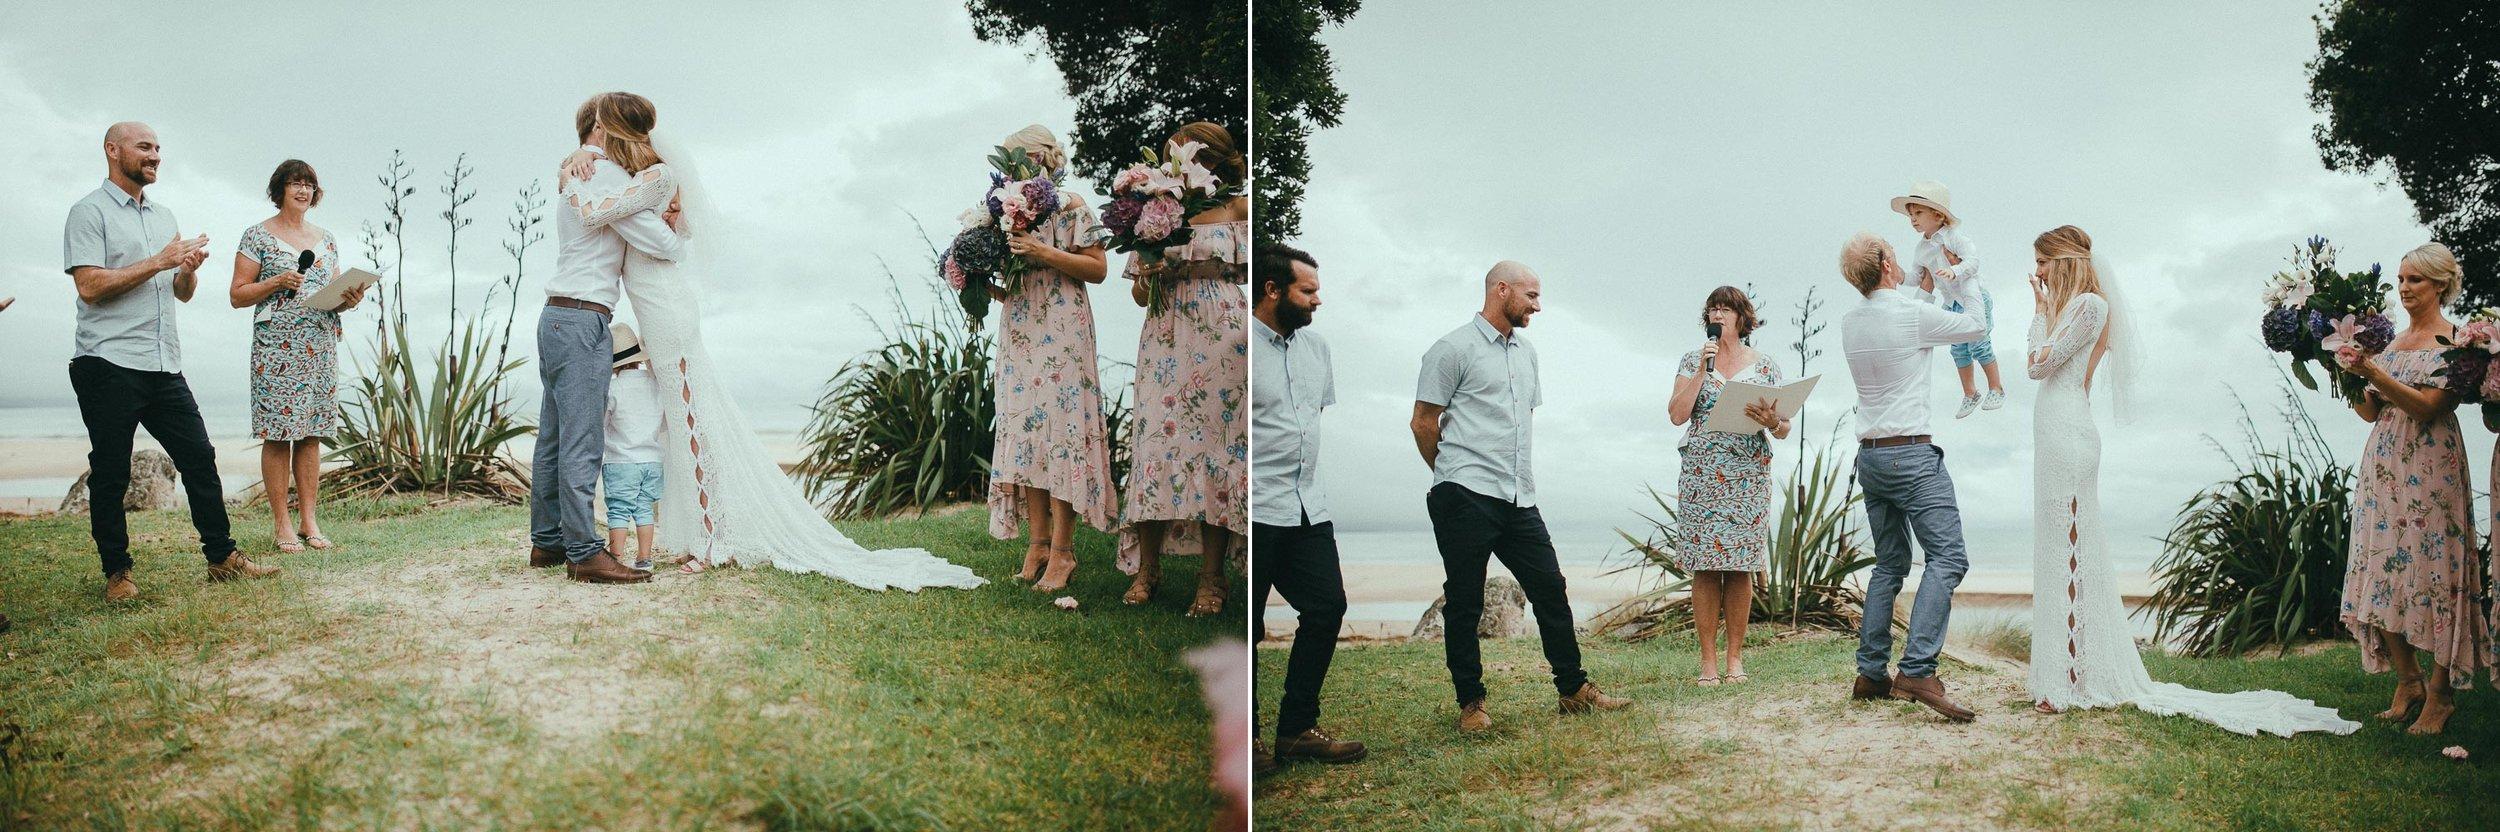 emotional-wedding-new-zealand81.jpg